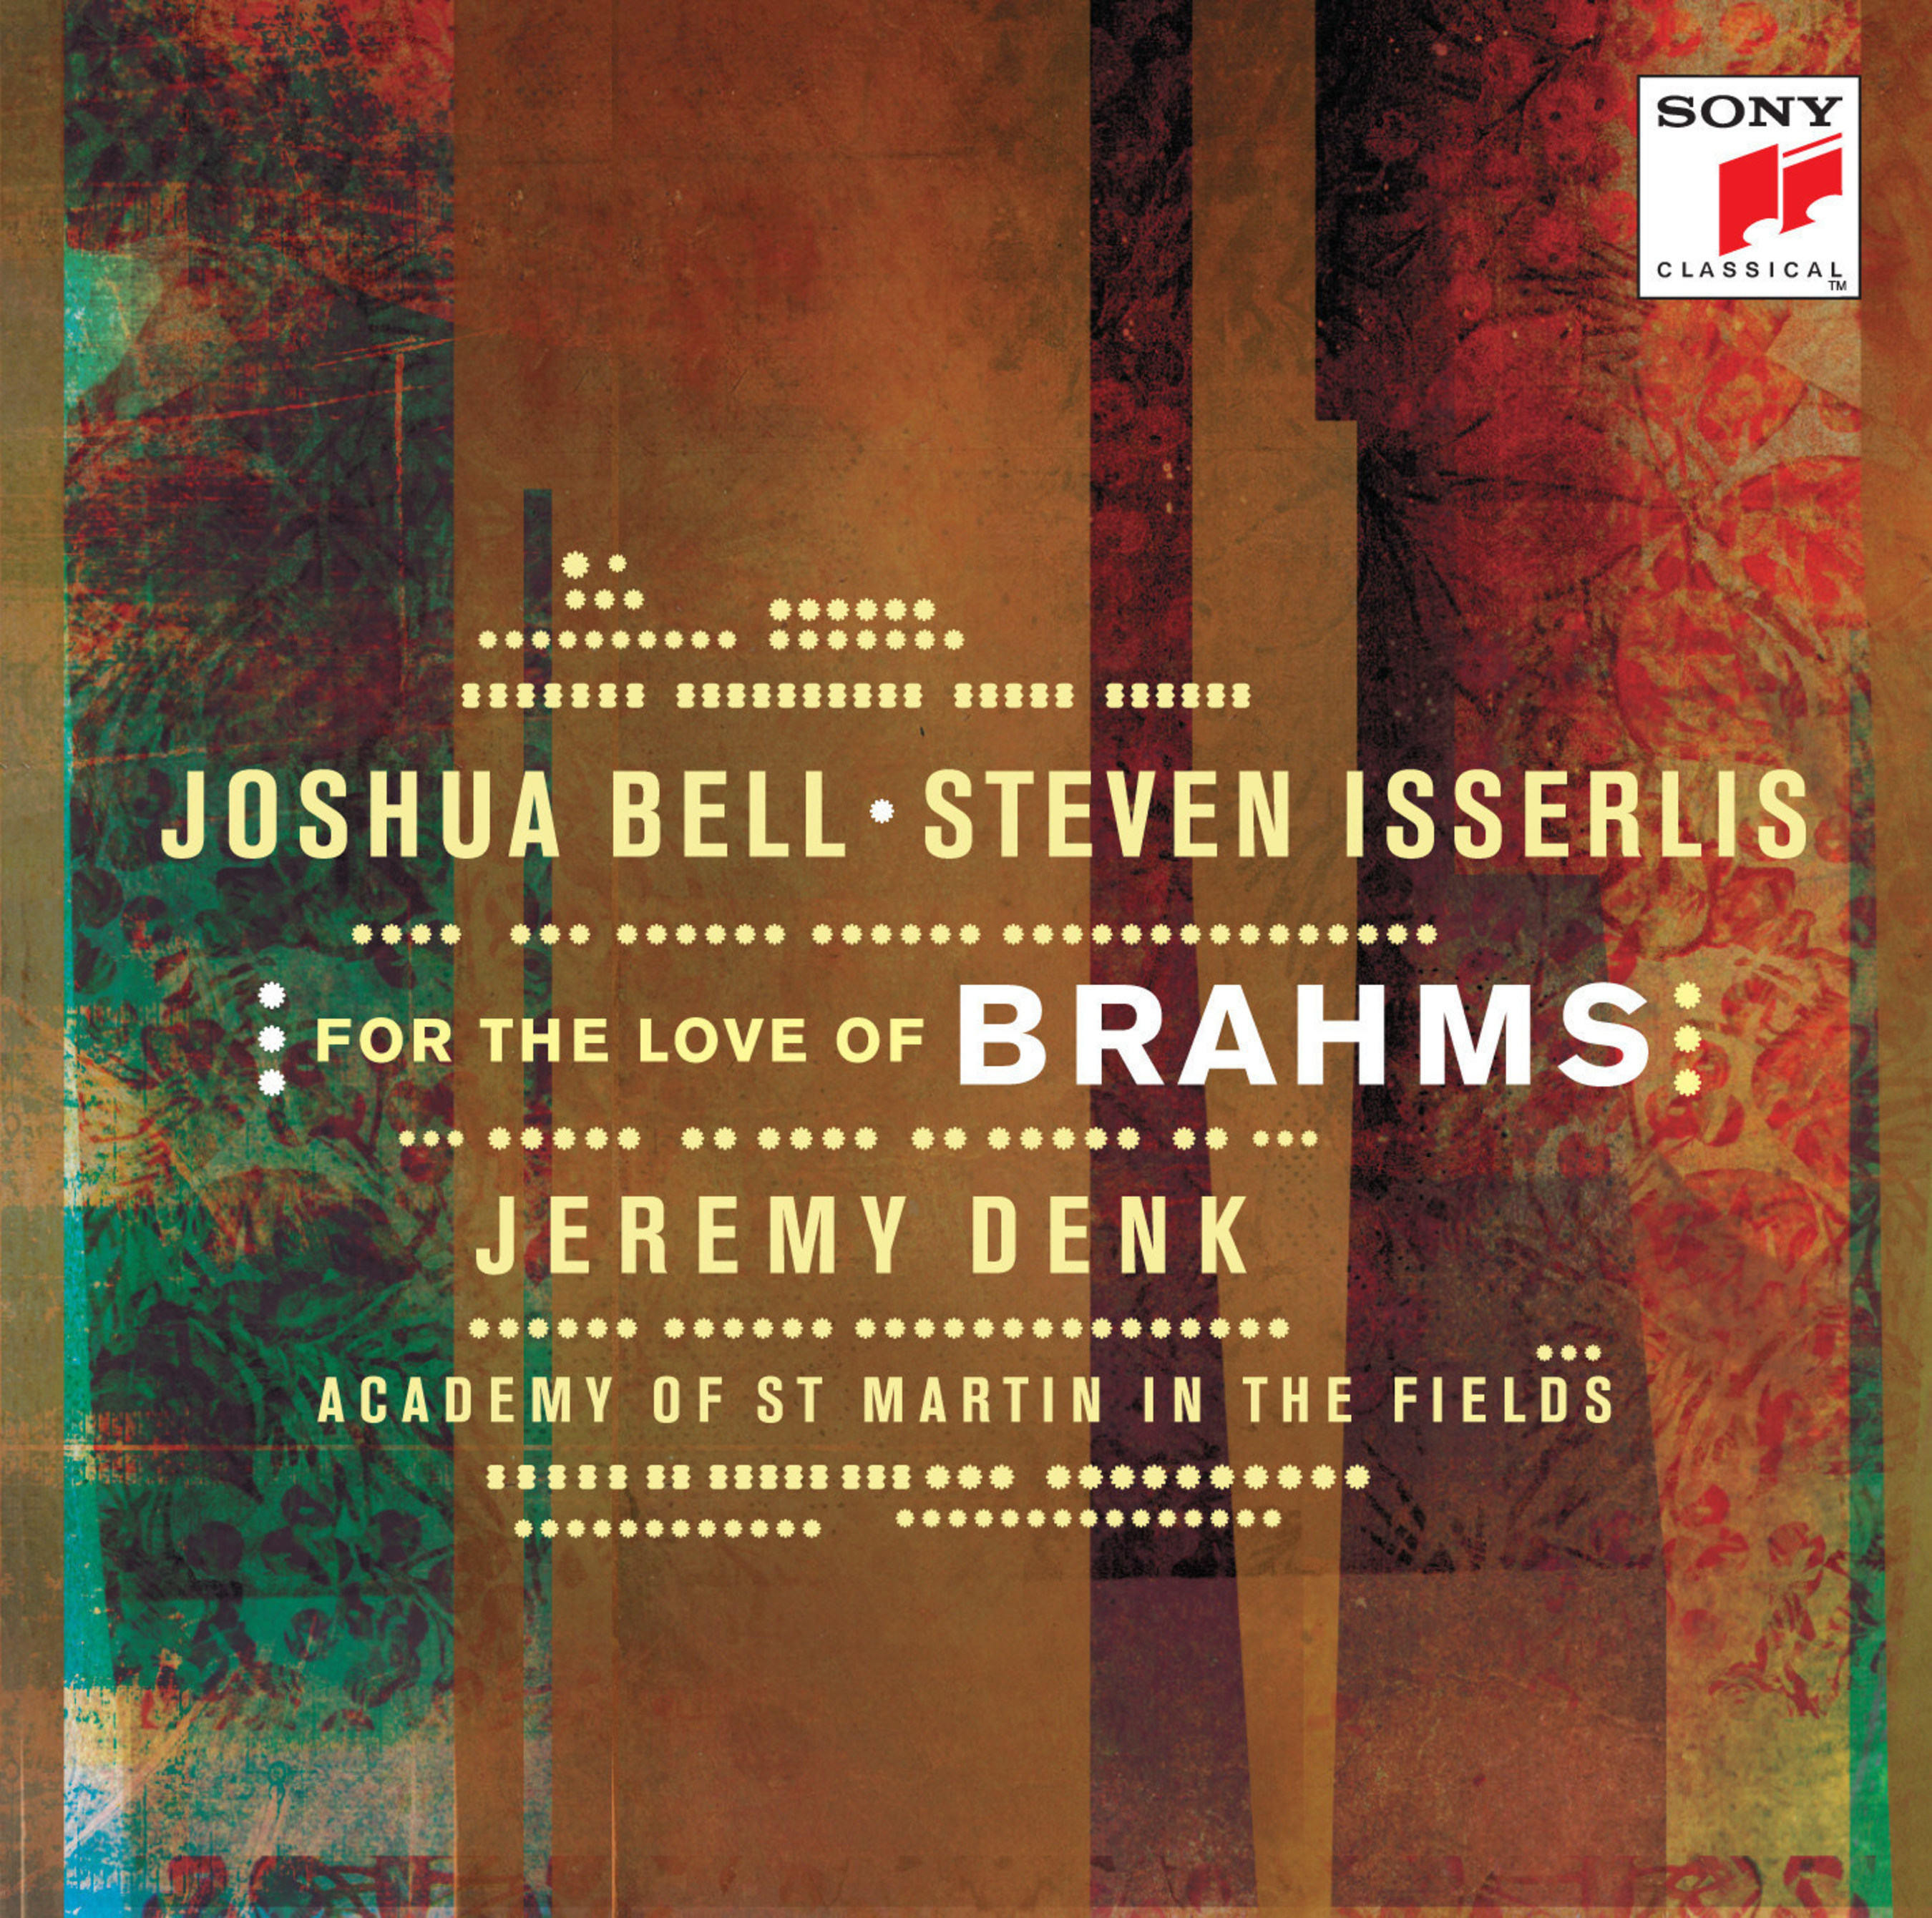 Joshua Bell - For The Love of Brahms - Available September 30